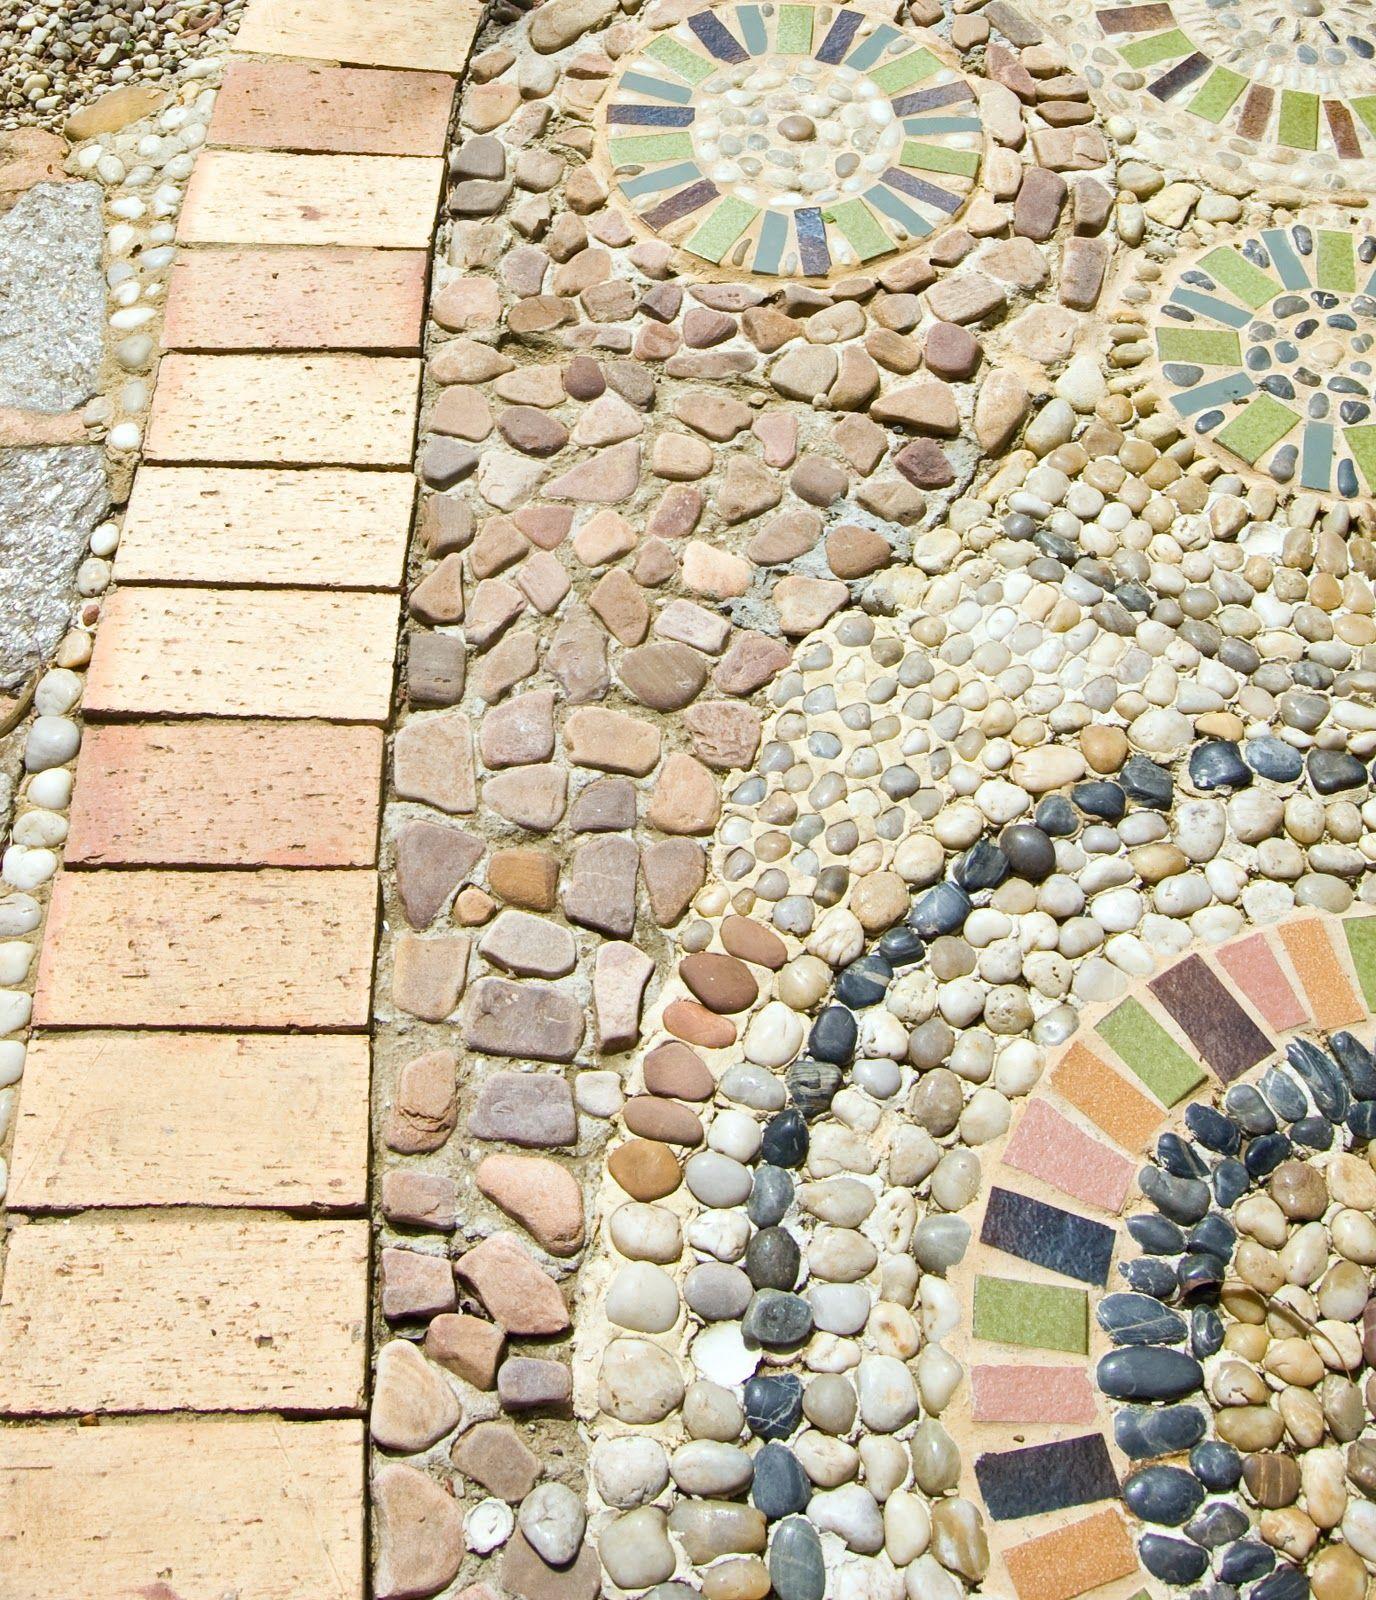 Astonishing Mosiac Garden Walk 12 Of 22 The Wunderkammer Tickletank A Living Work Of Art Mosaic Garden